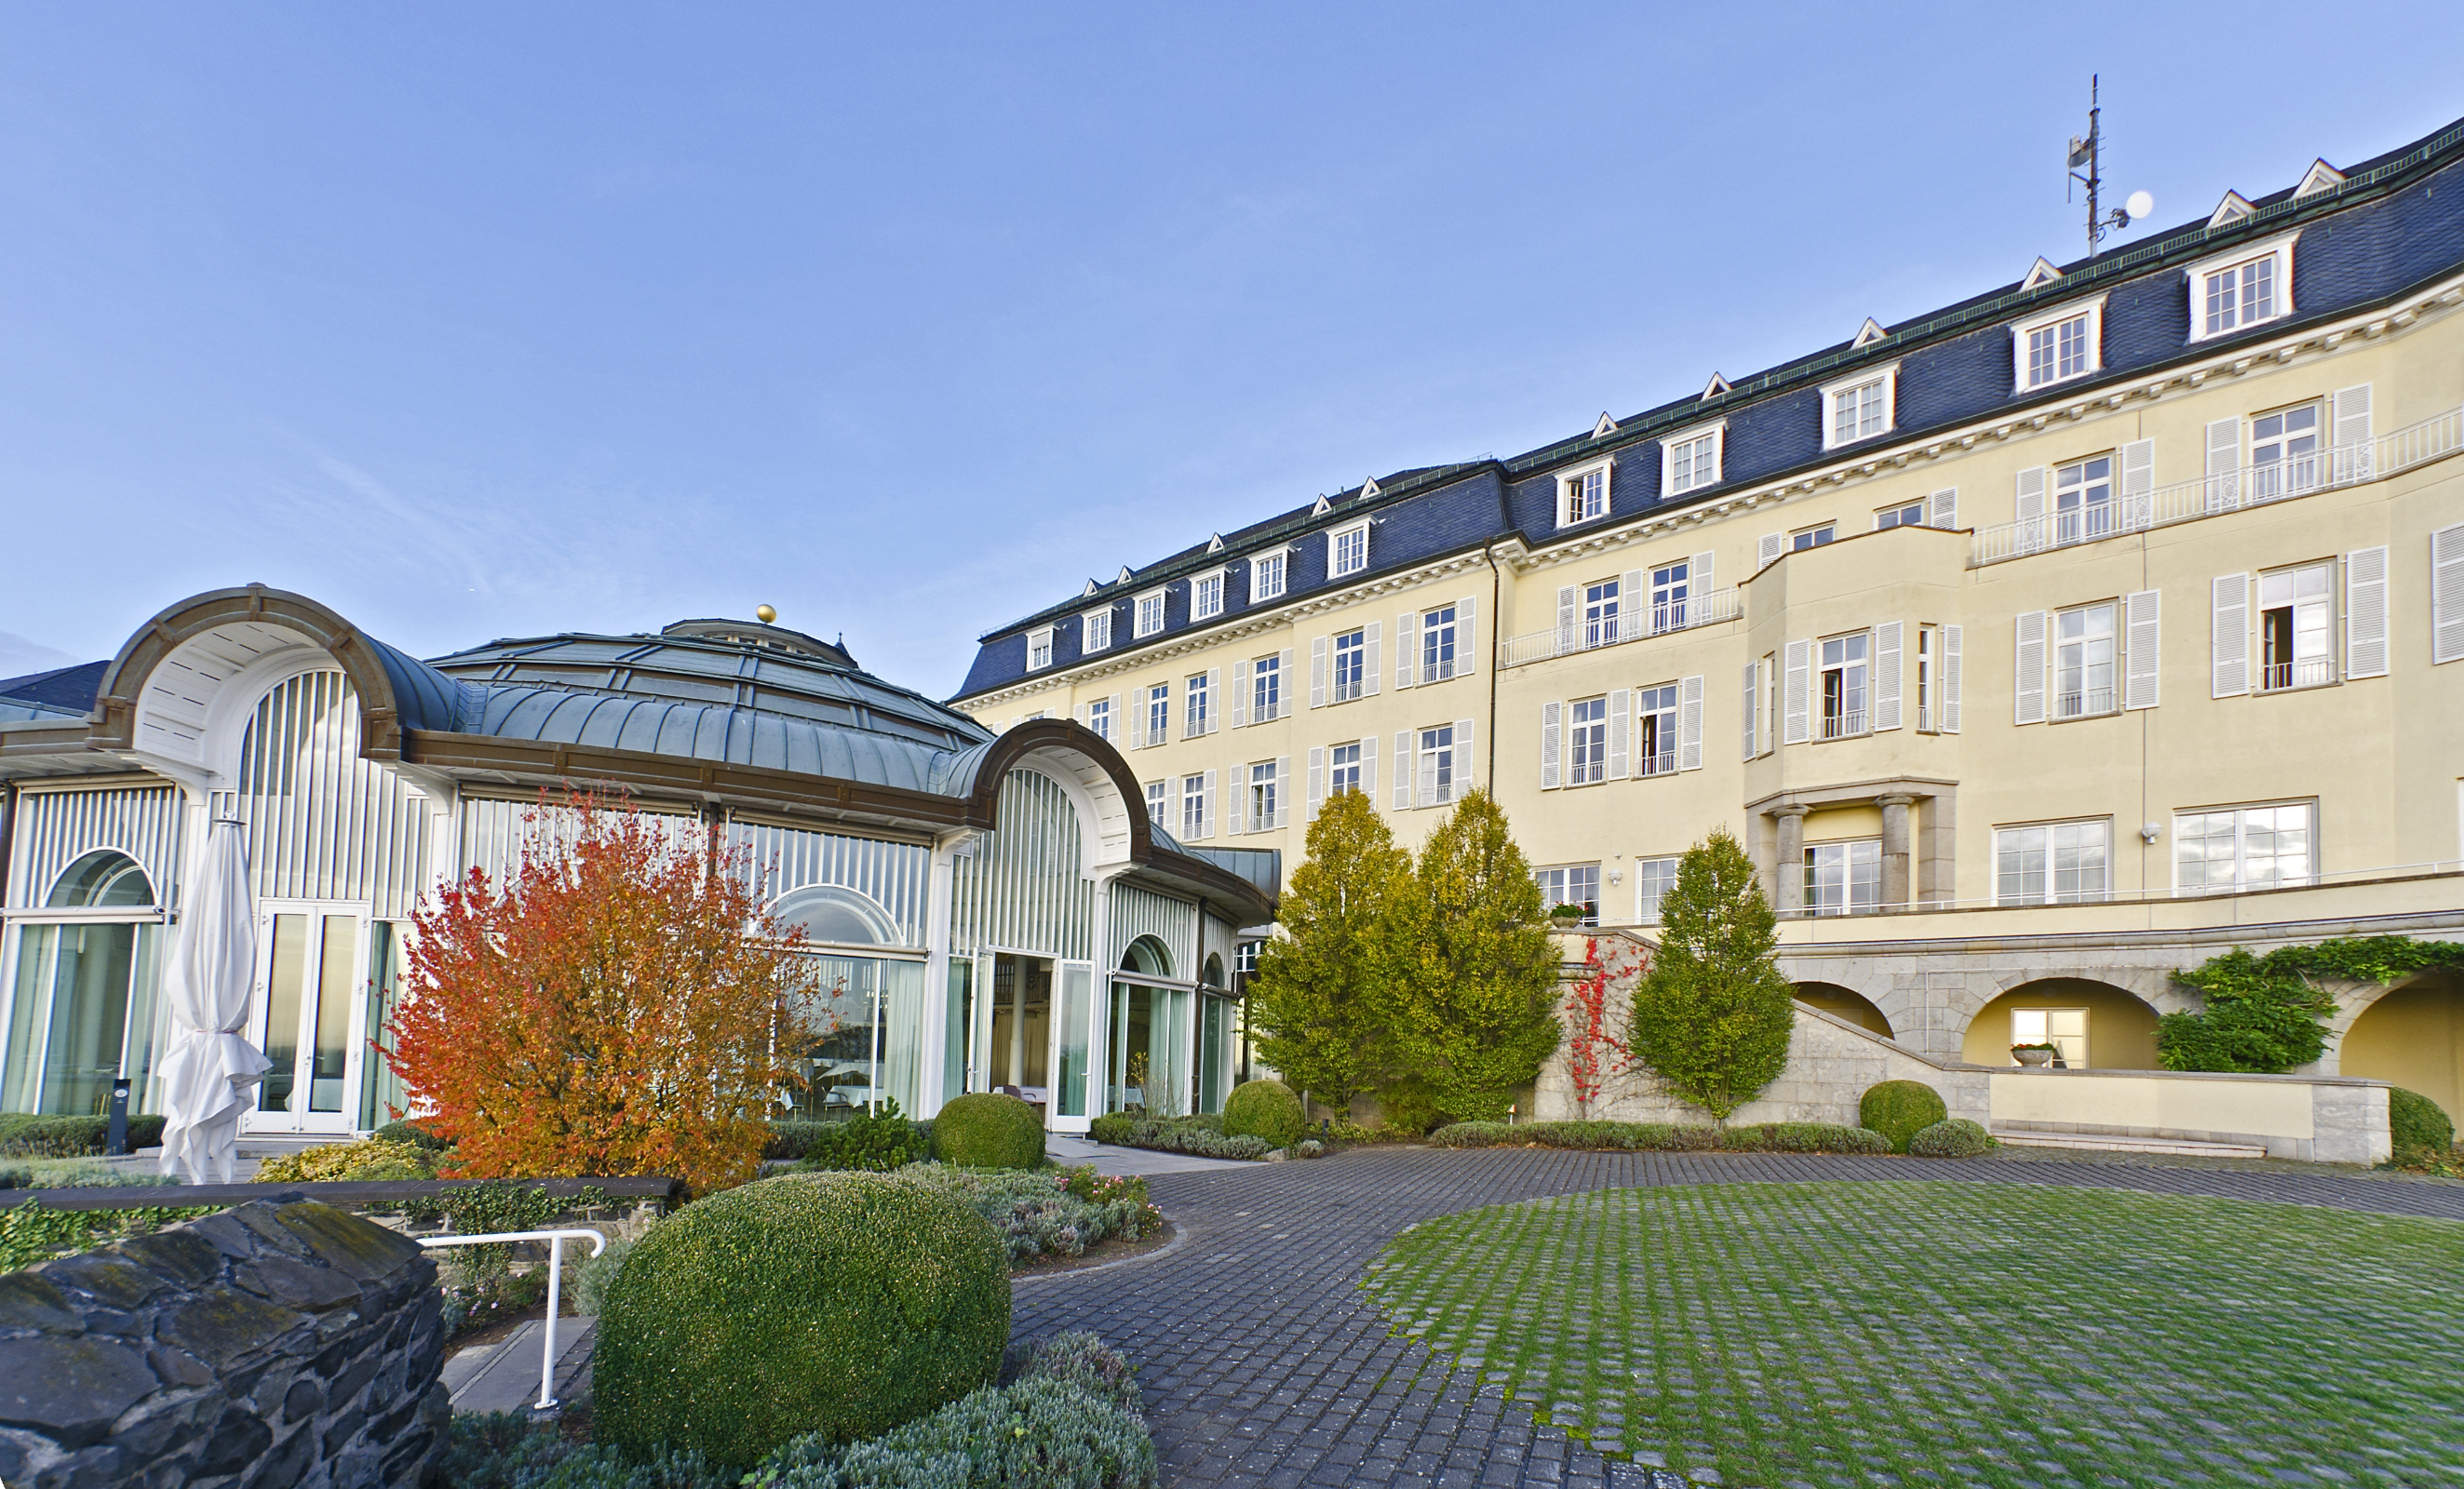 Steigenberger Grandhotel & Spa Petersberg Bonn - new 'Steigenberger Icons' Hotel